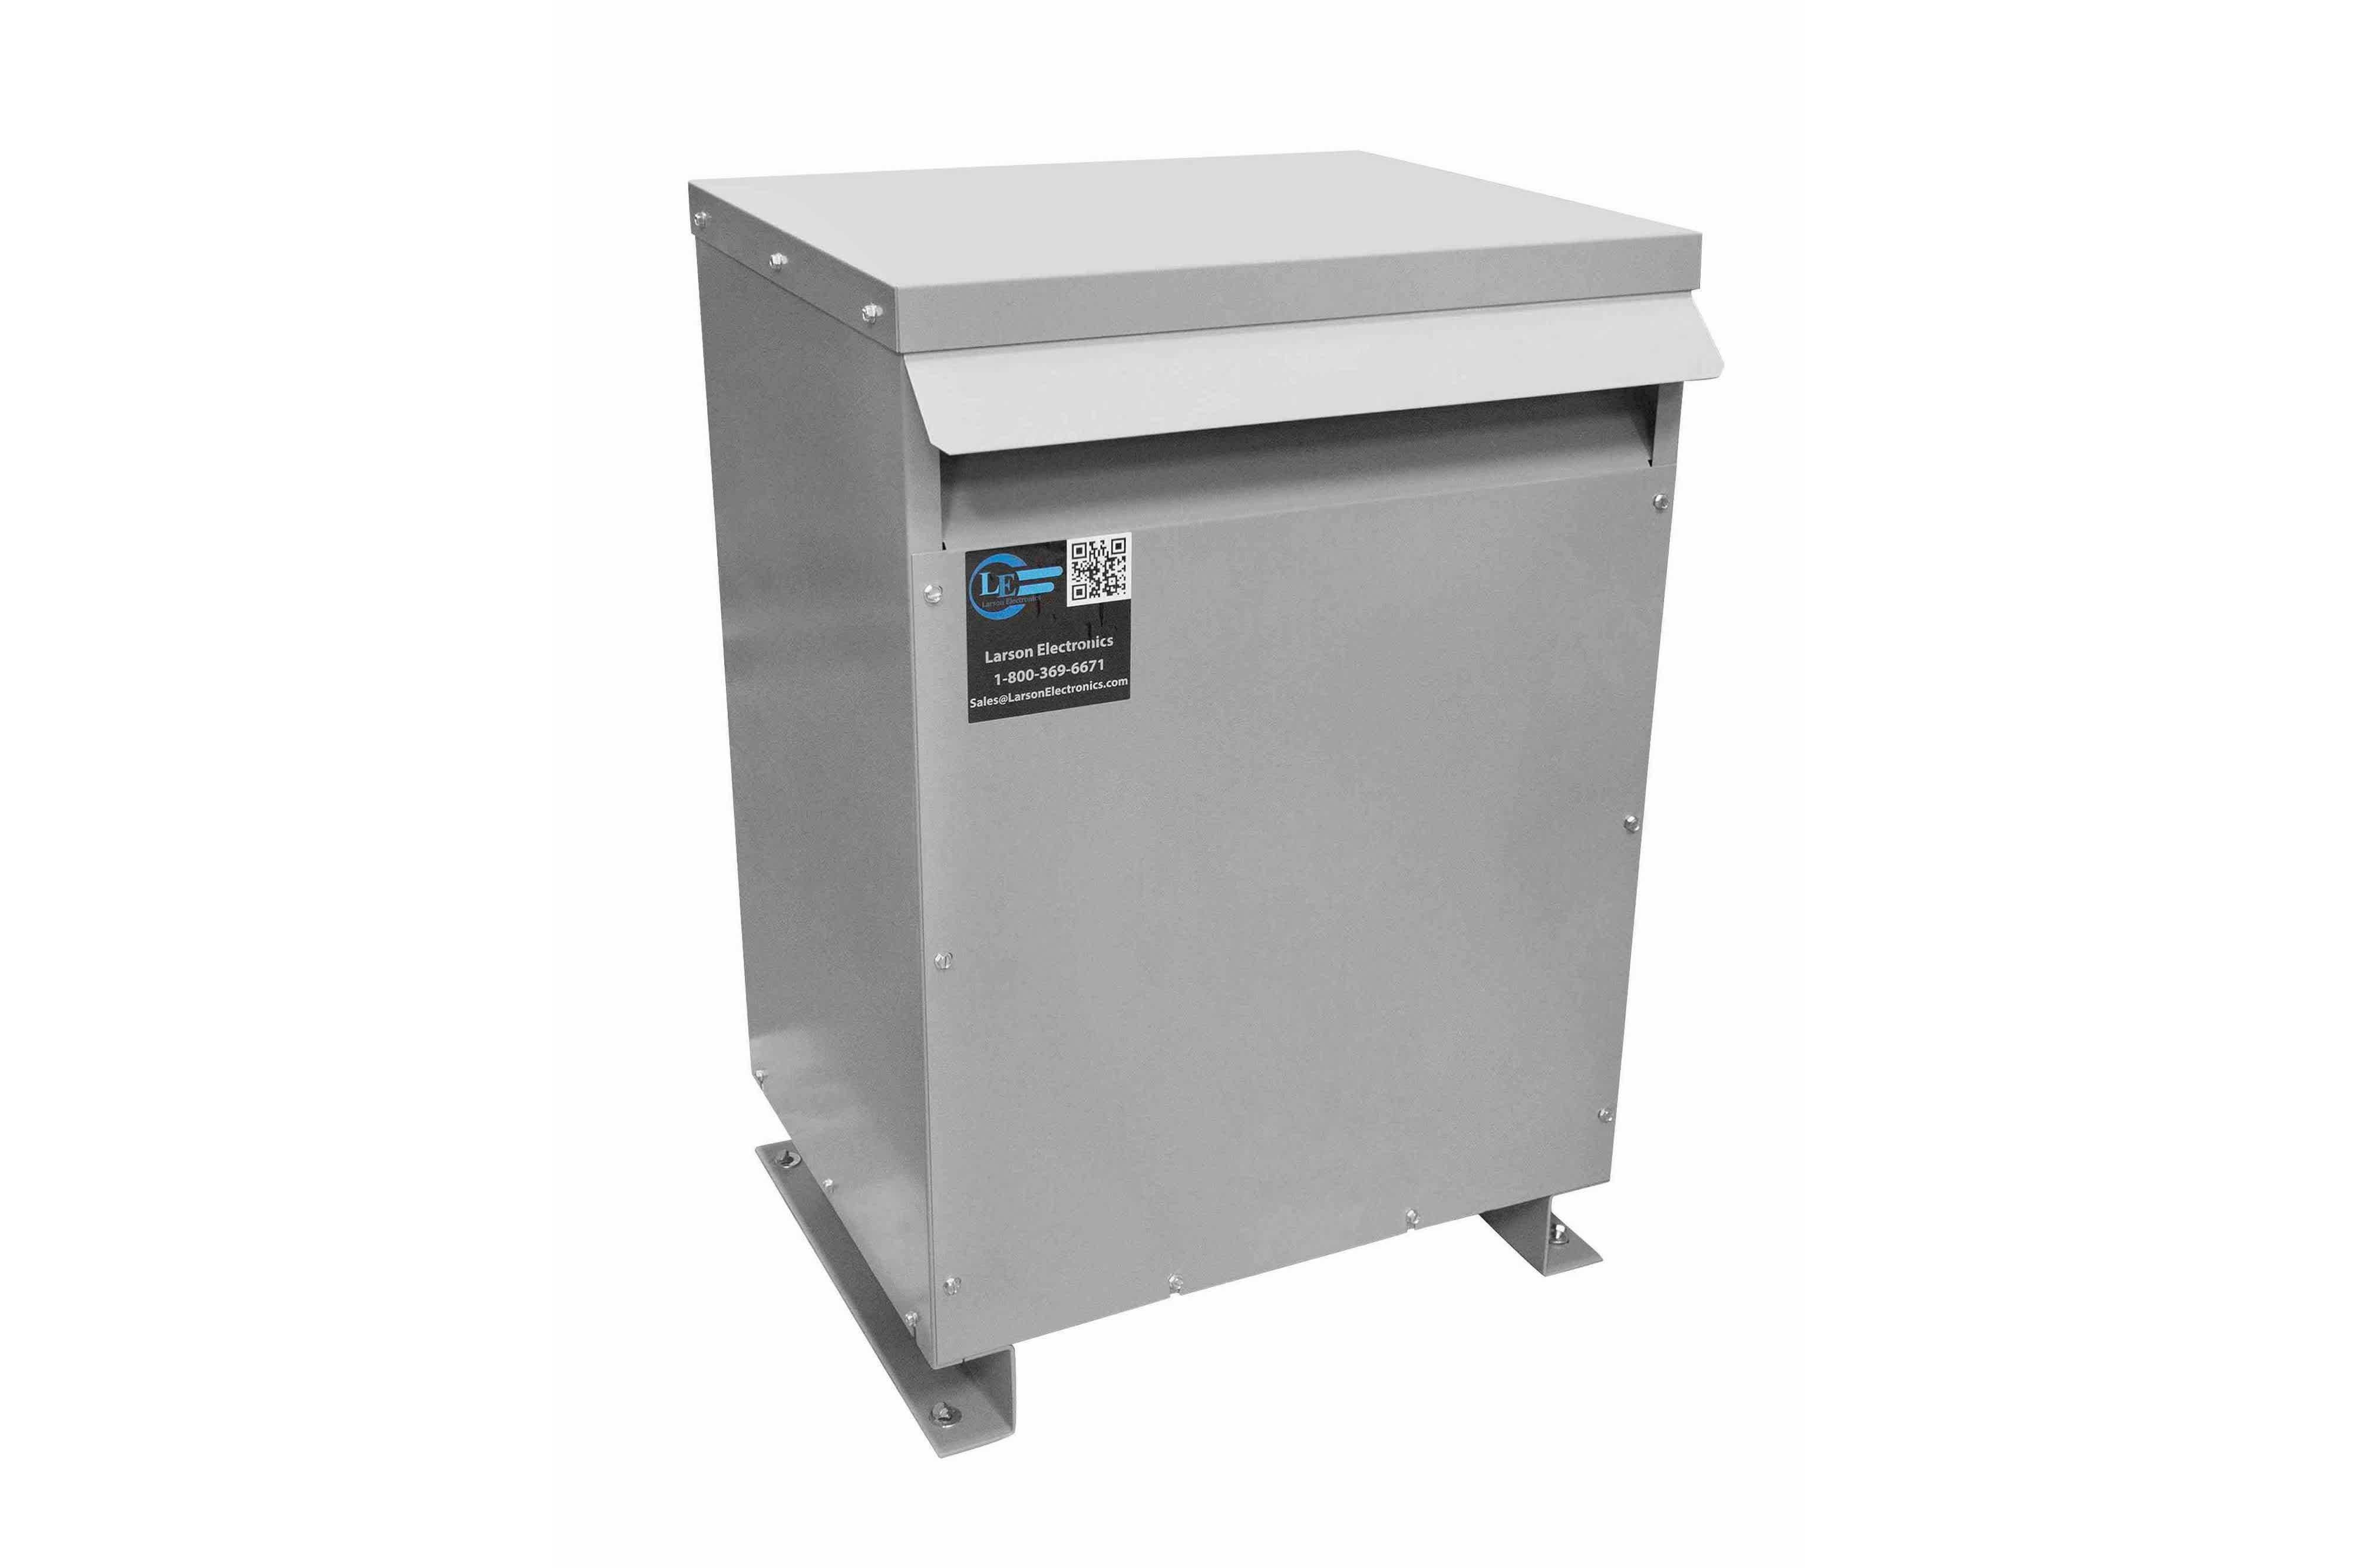 35 kVA 3PH Isolation Transformer, 240V Wye Primary, 208V Delta Secondary, N3R, Ventilated, 60 Hz